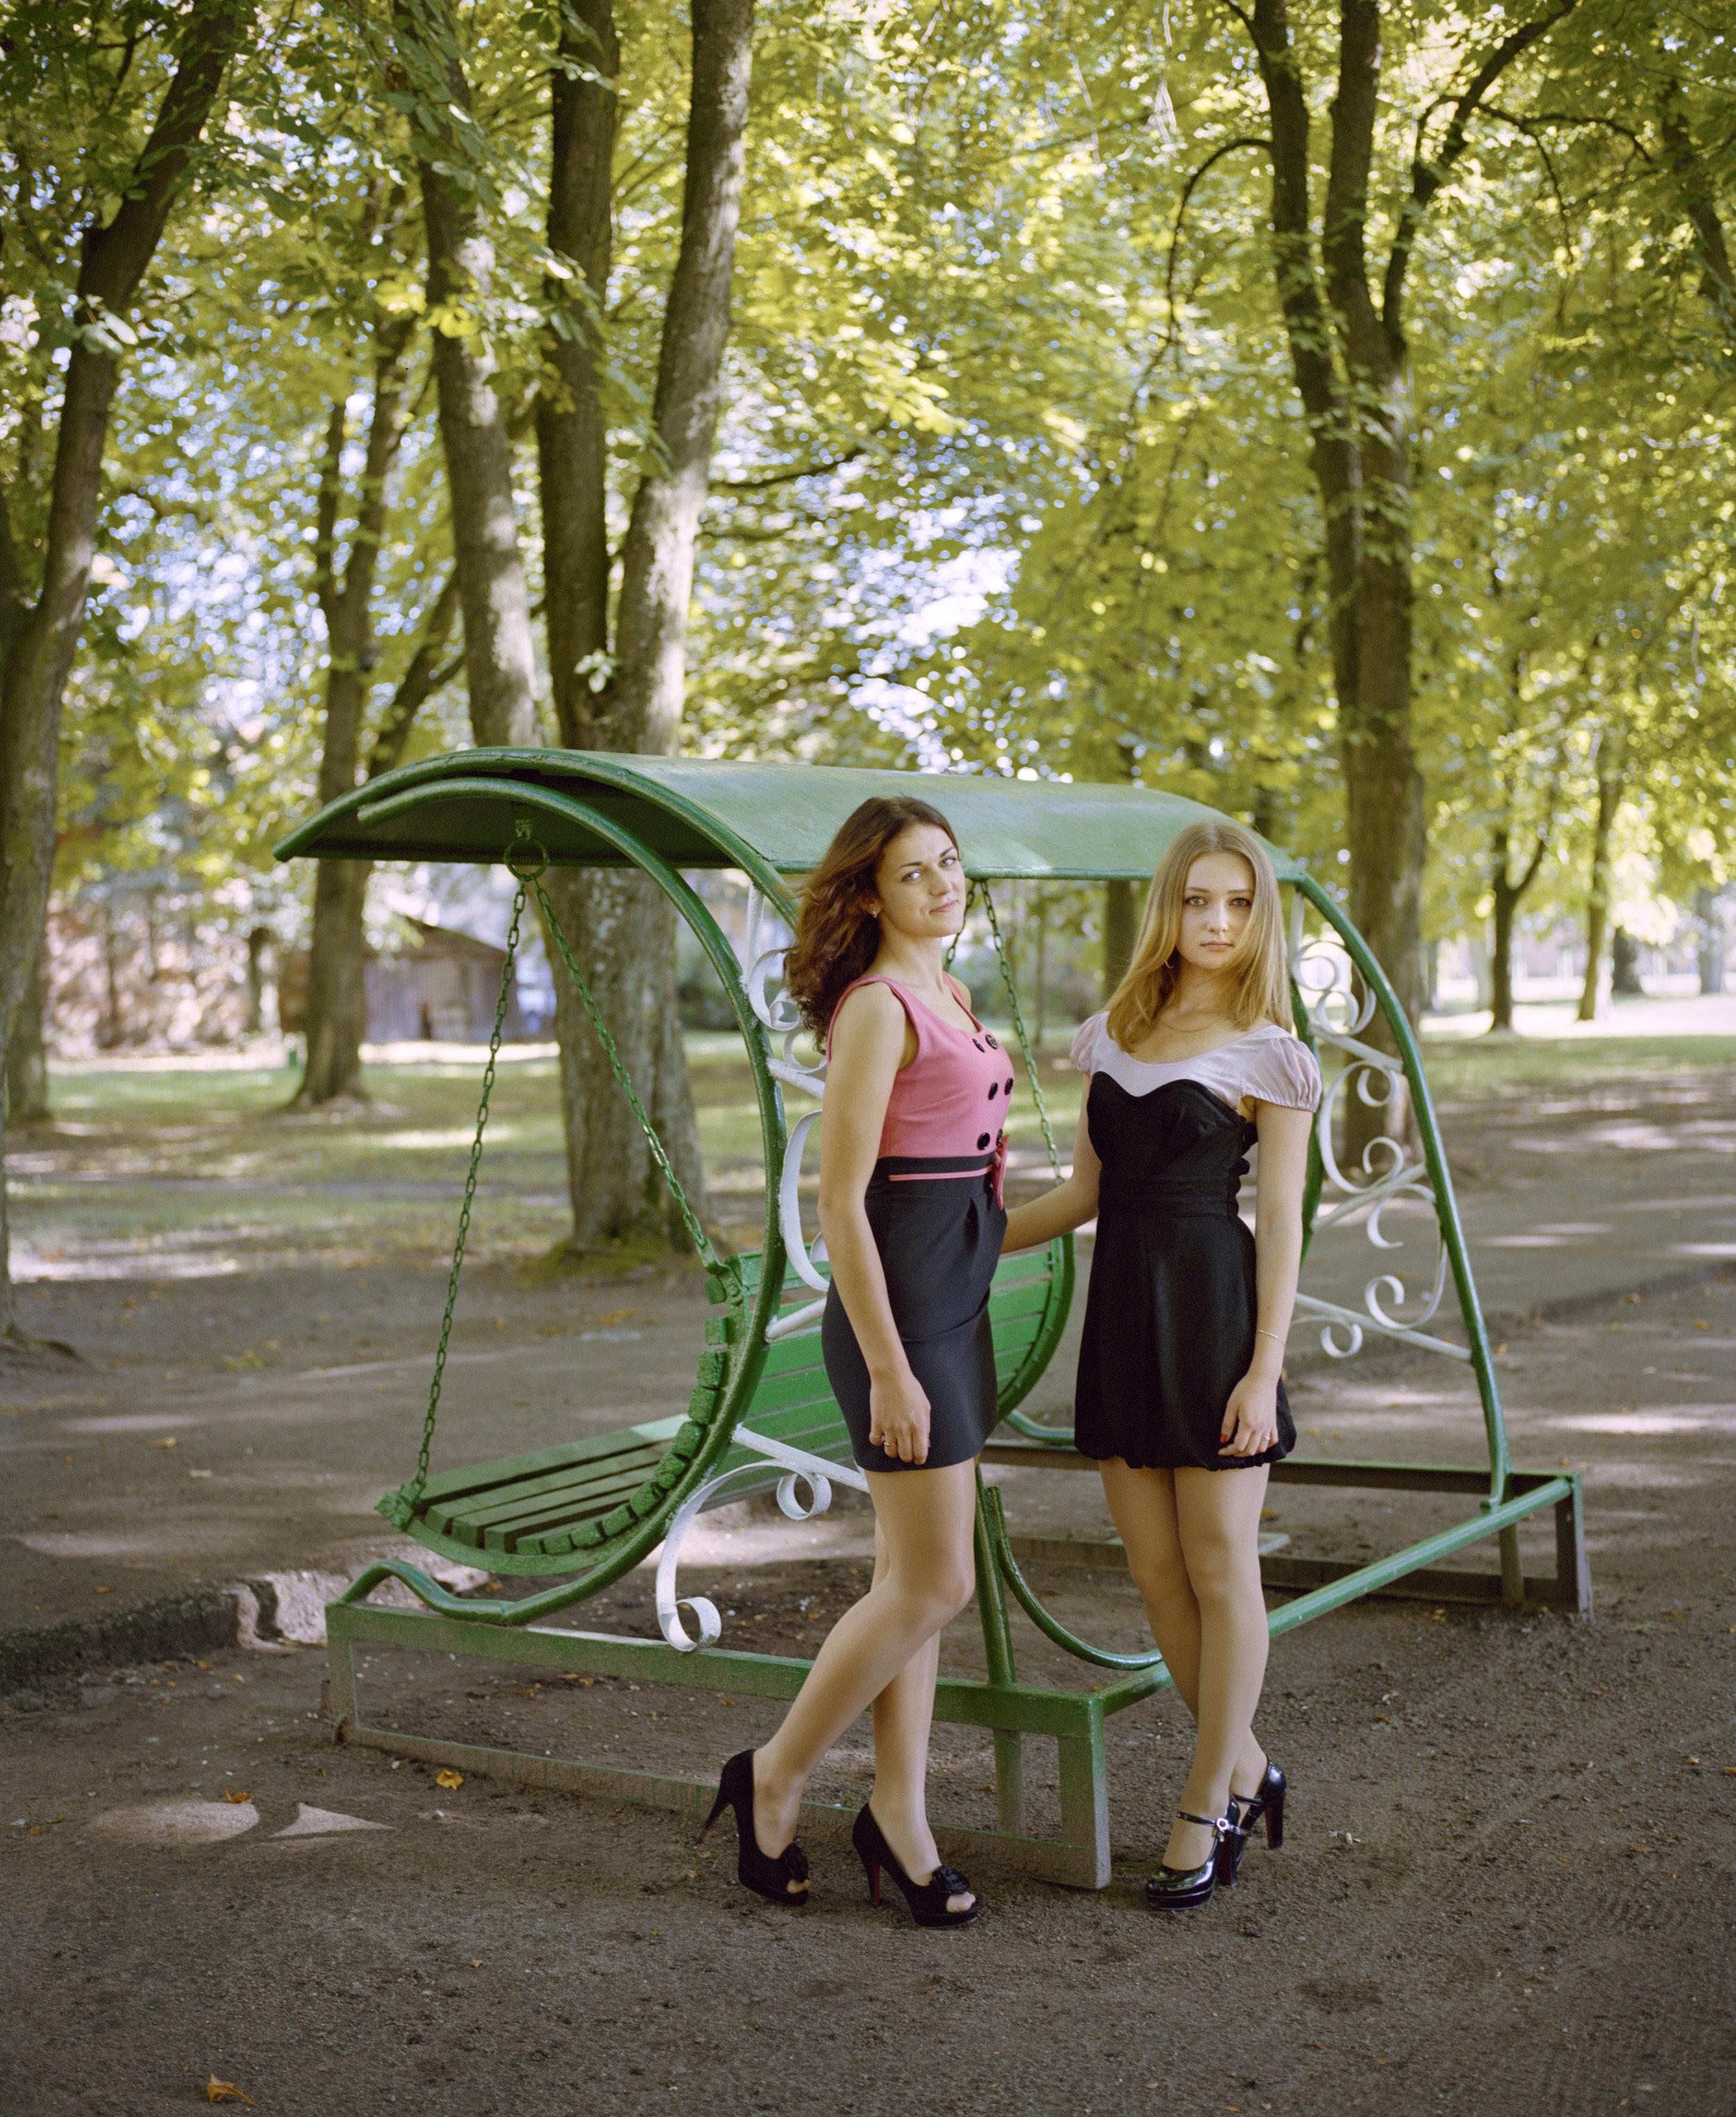 Nadia and Andzelika in city park of Pravdinsk, Kaliningrad